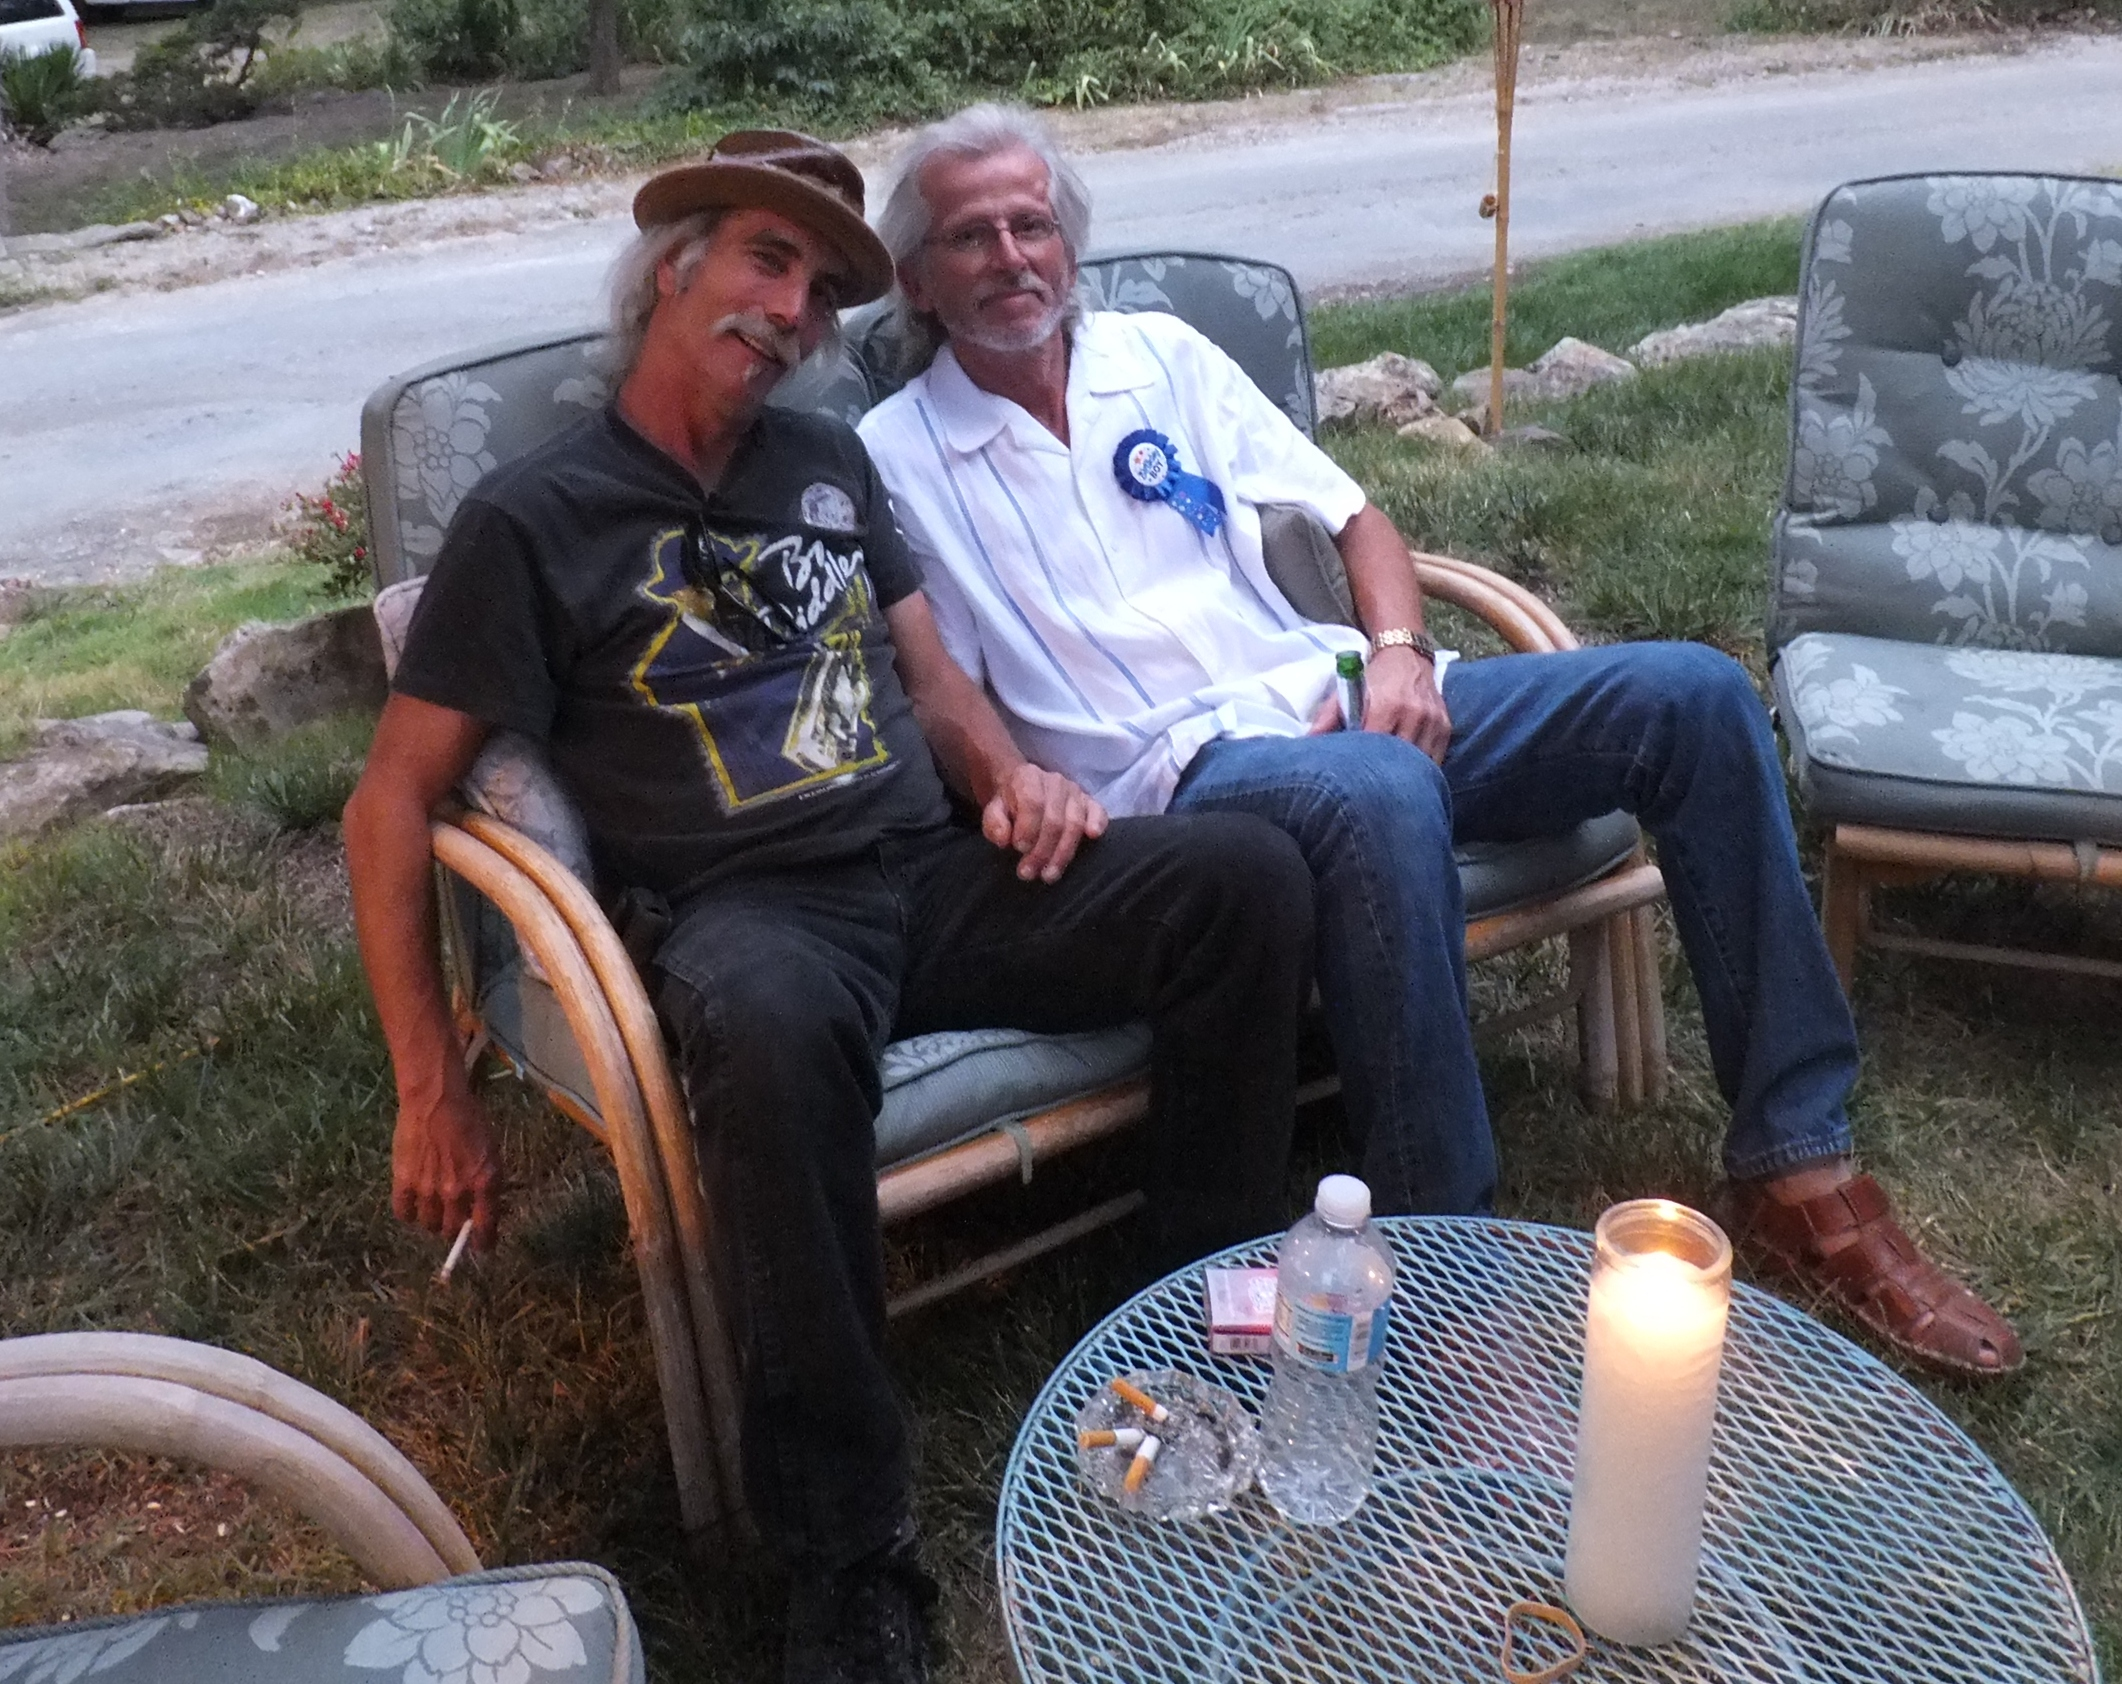 Pete and Bob